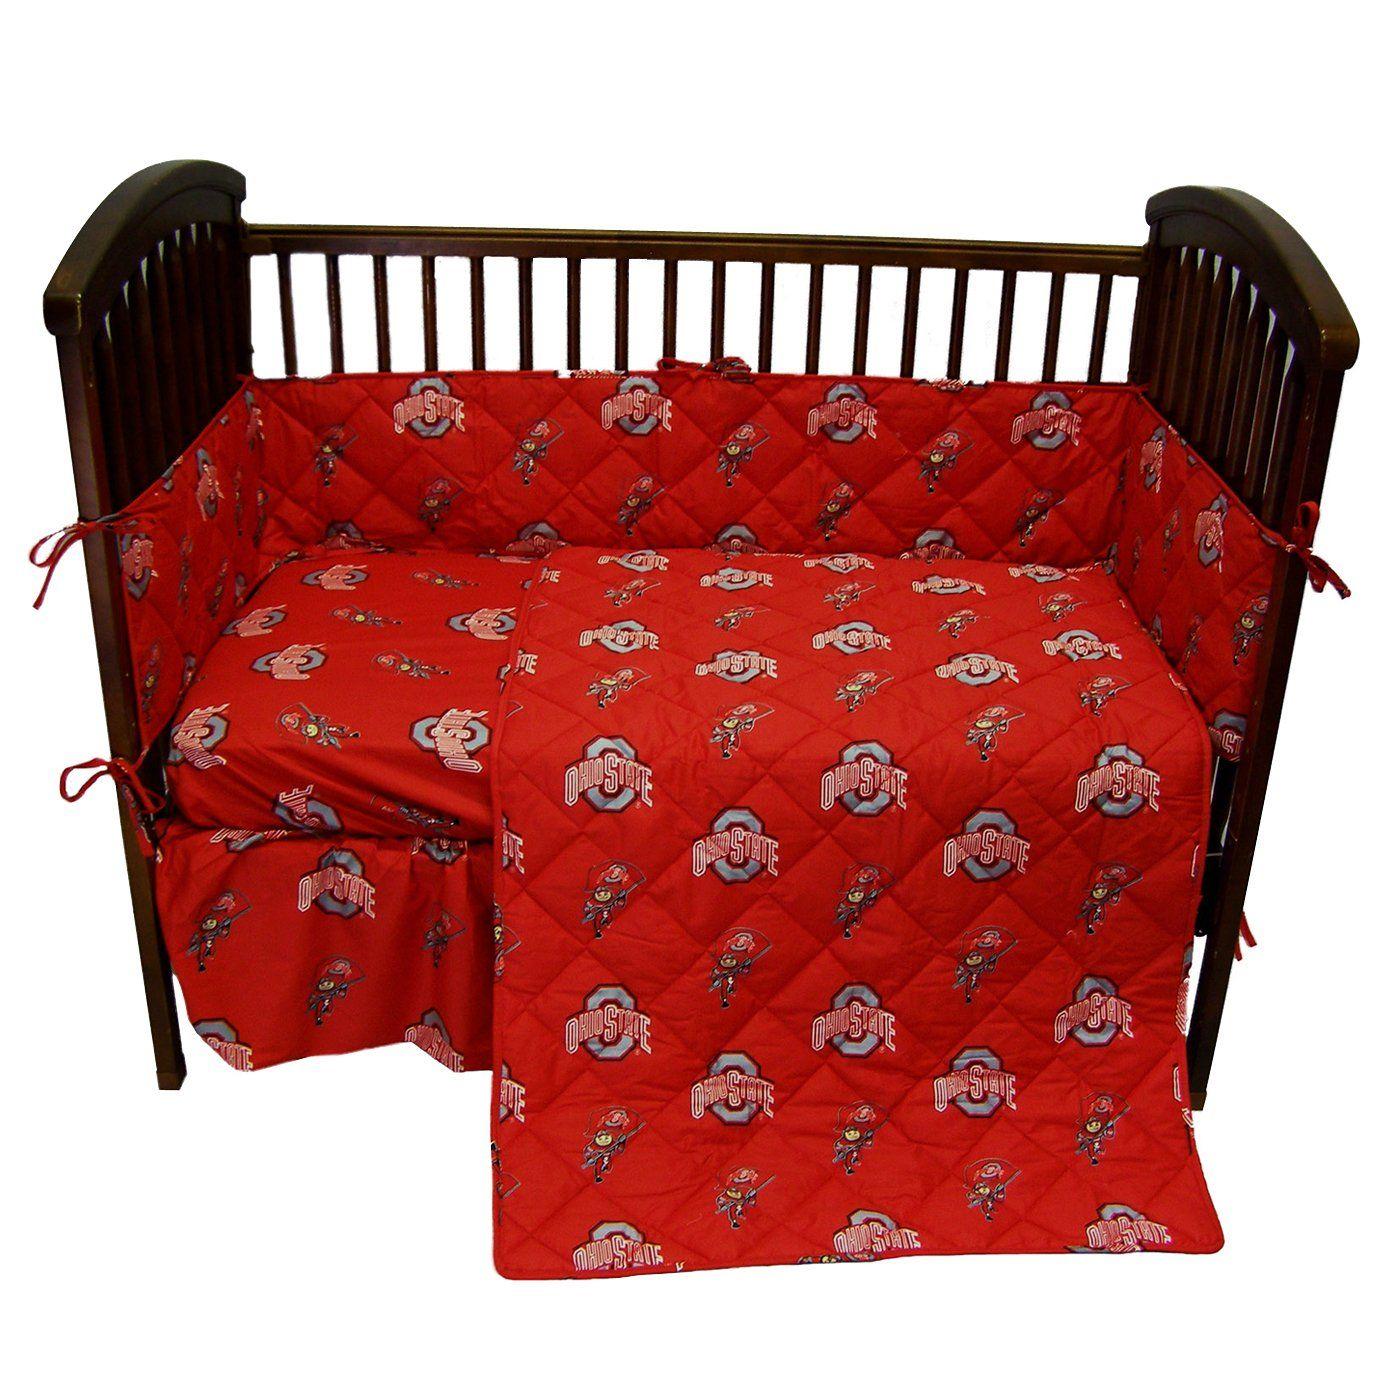 College Covers Ohics Ohio State Buckeyes Crib Bedding Set 5 Pieces Baby Crib Sets Baby Crib Bedding Sets Buckeye Baby